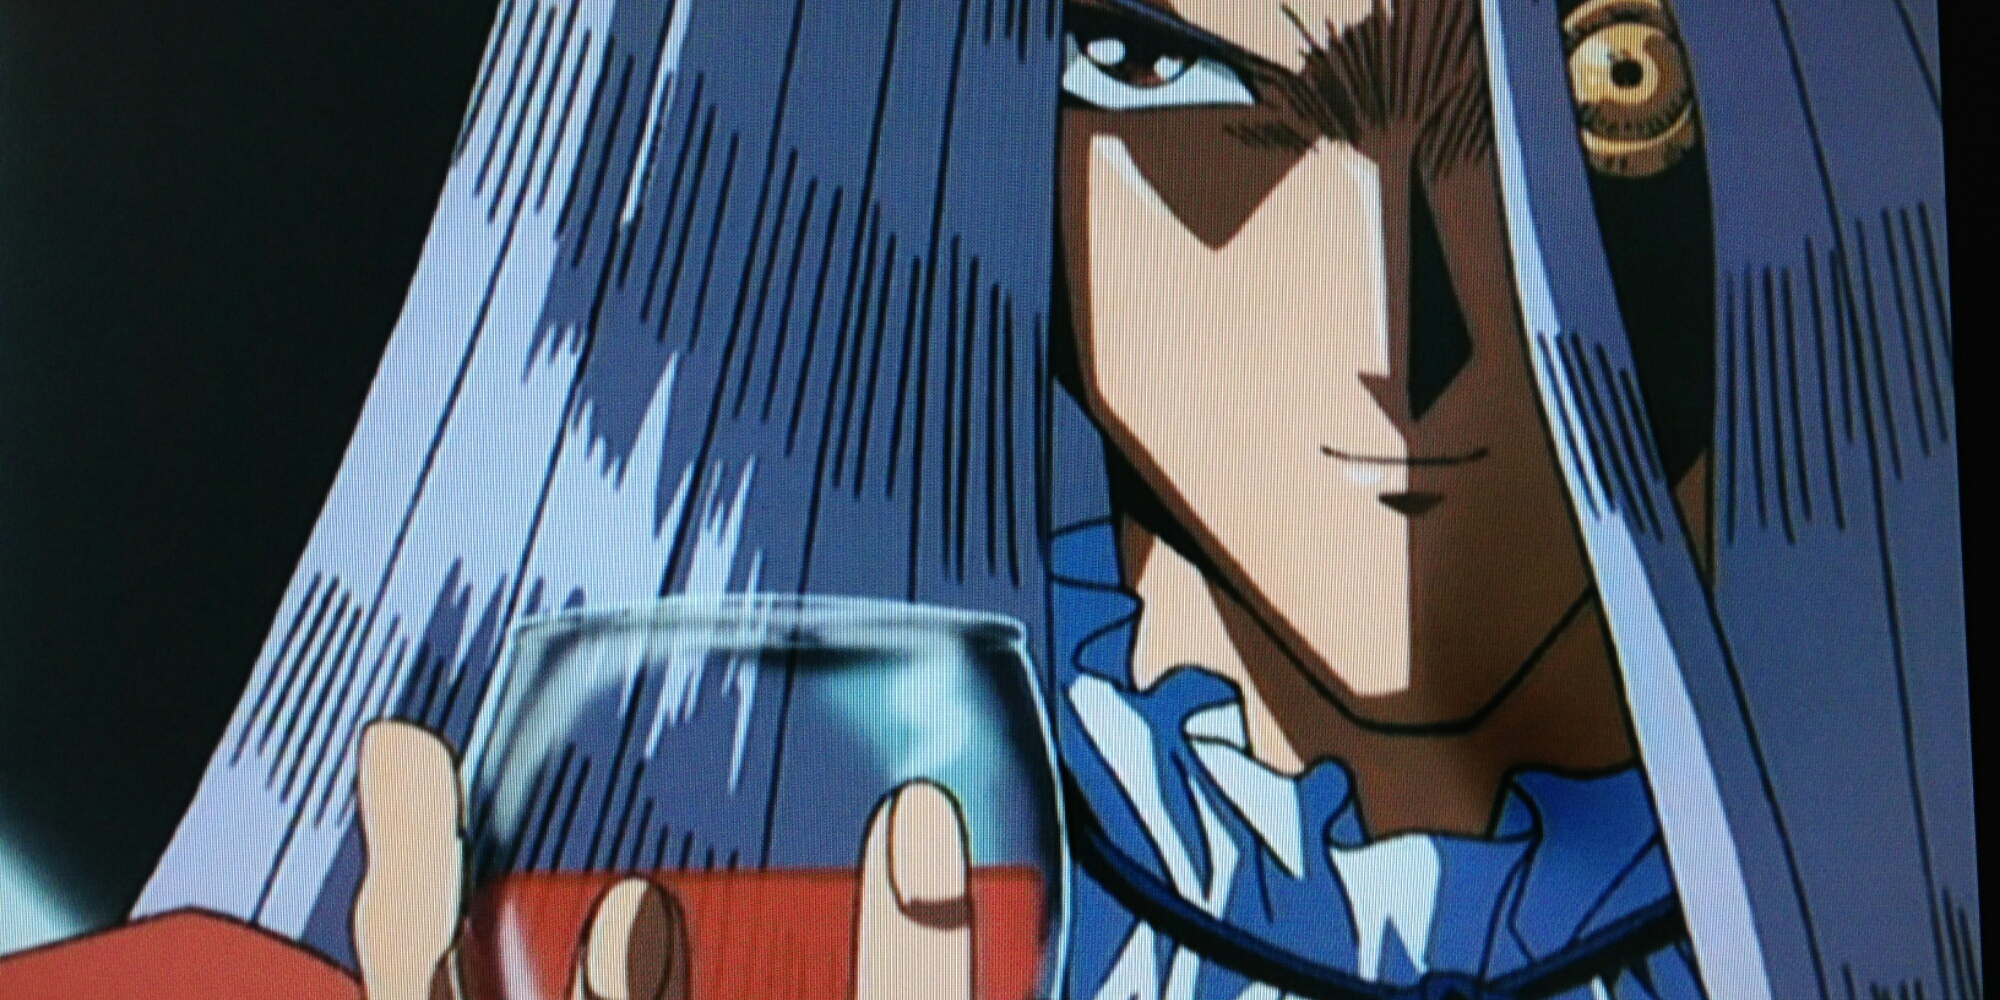 Pegasus is Back - Τι λετε για ένα ακόμη βασίλειο των μονομάχων? - Σελίδα 3 Pegasus-Wine-Yu-Gi-Oh